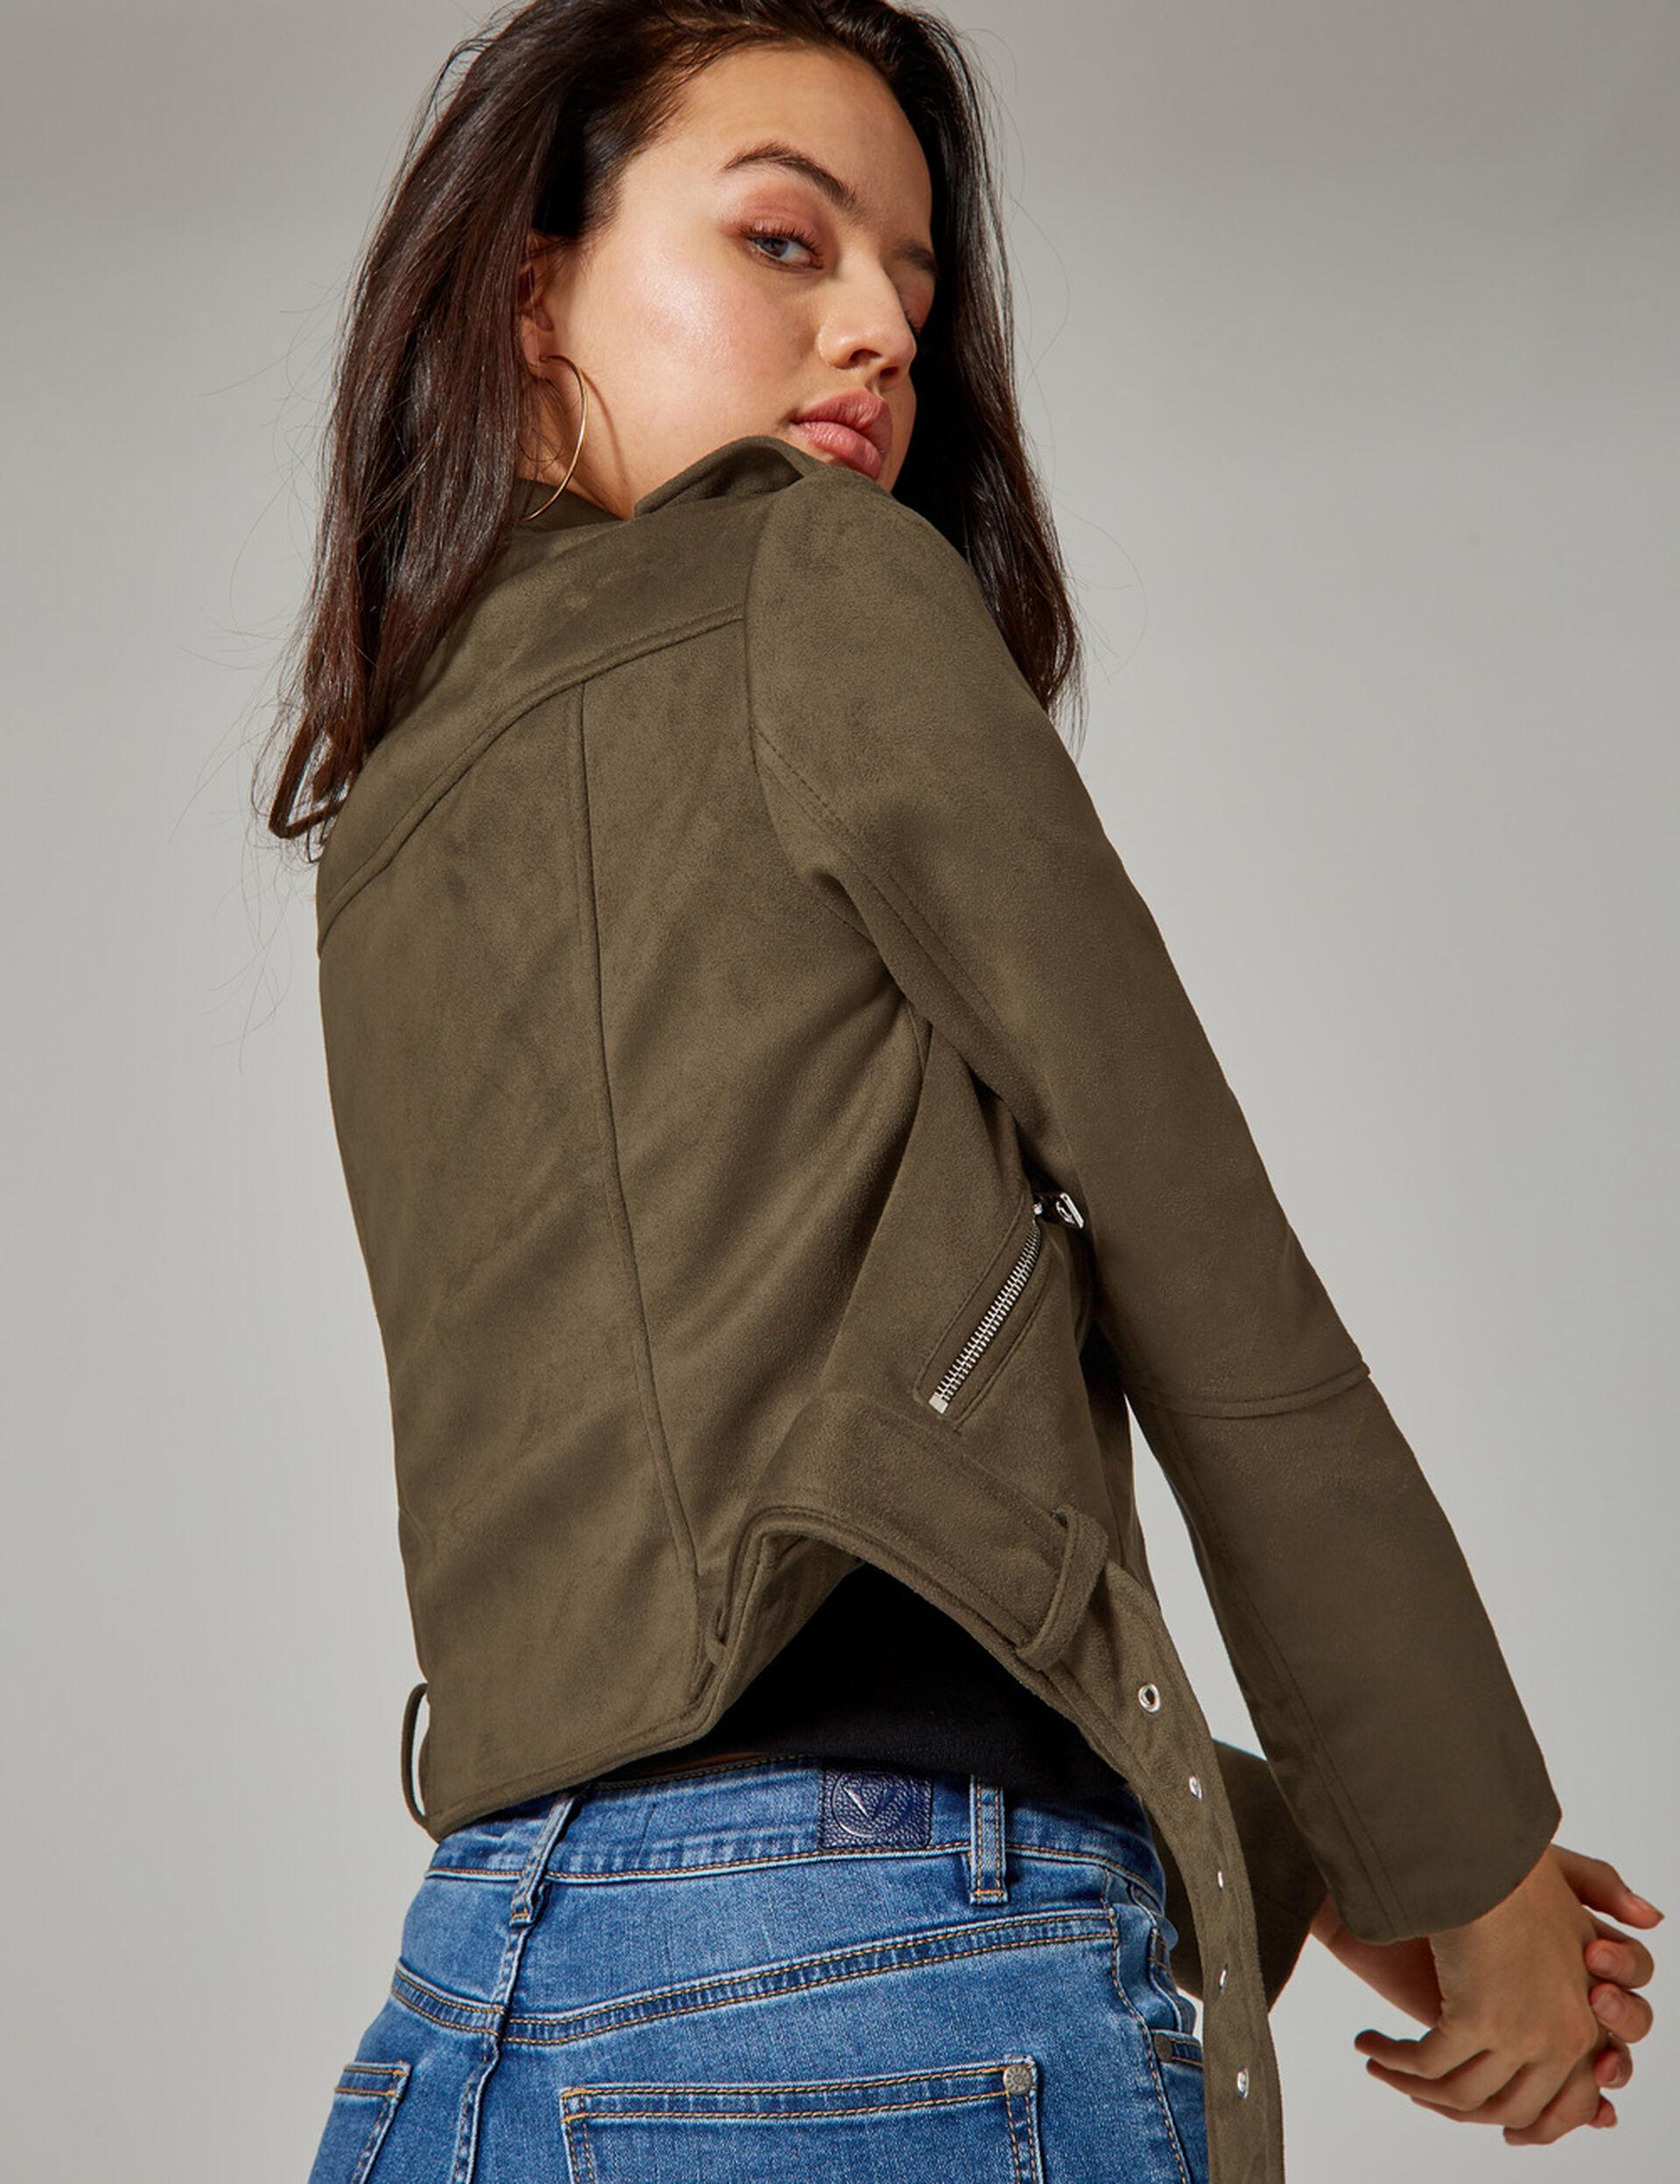 Khaki faux suede biker jacket